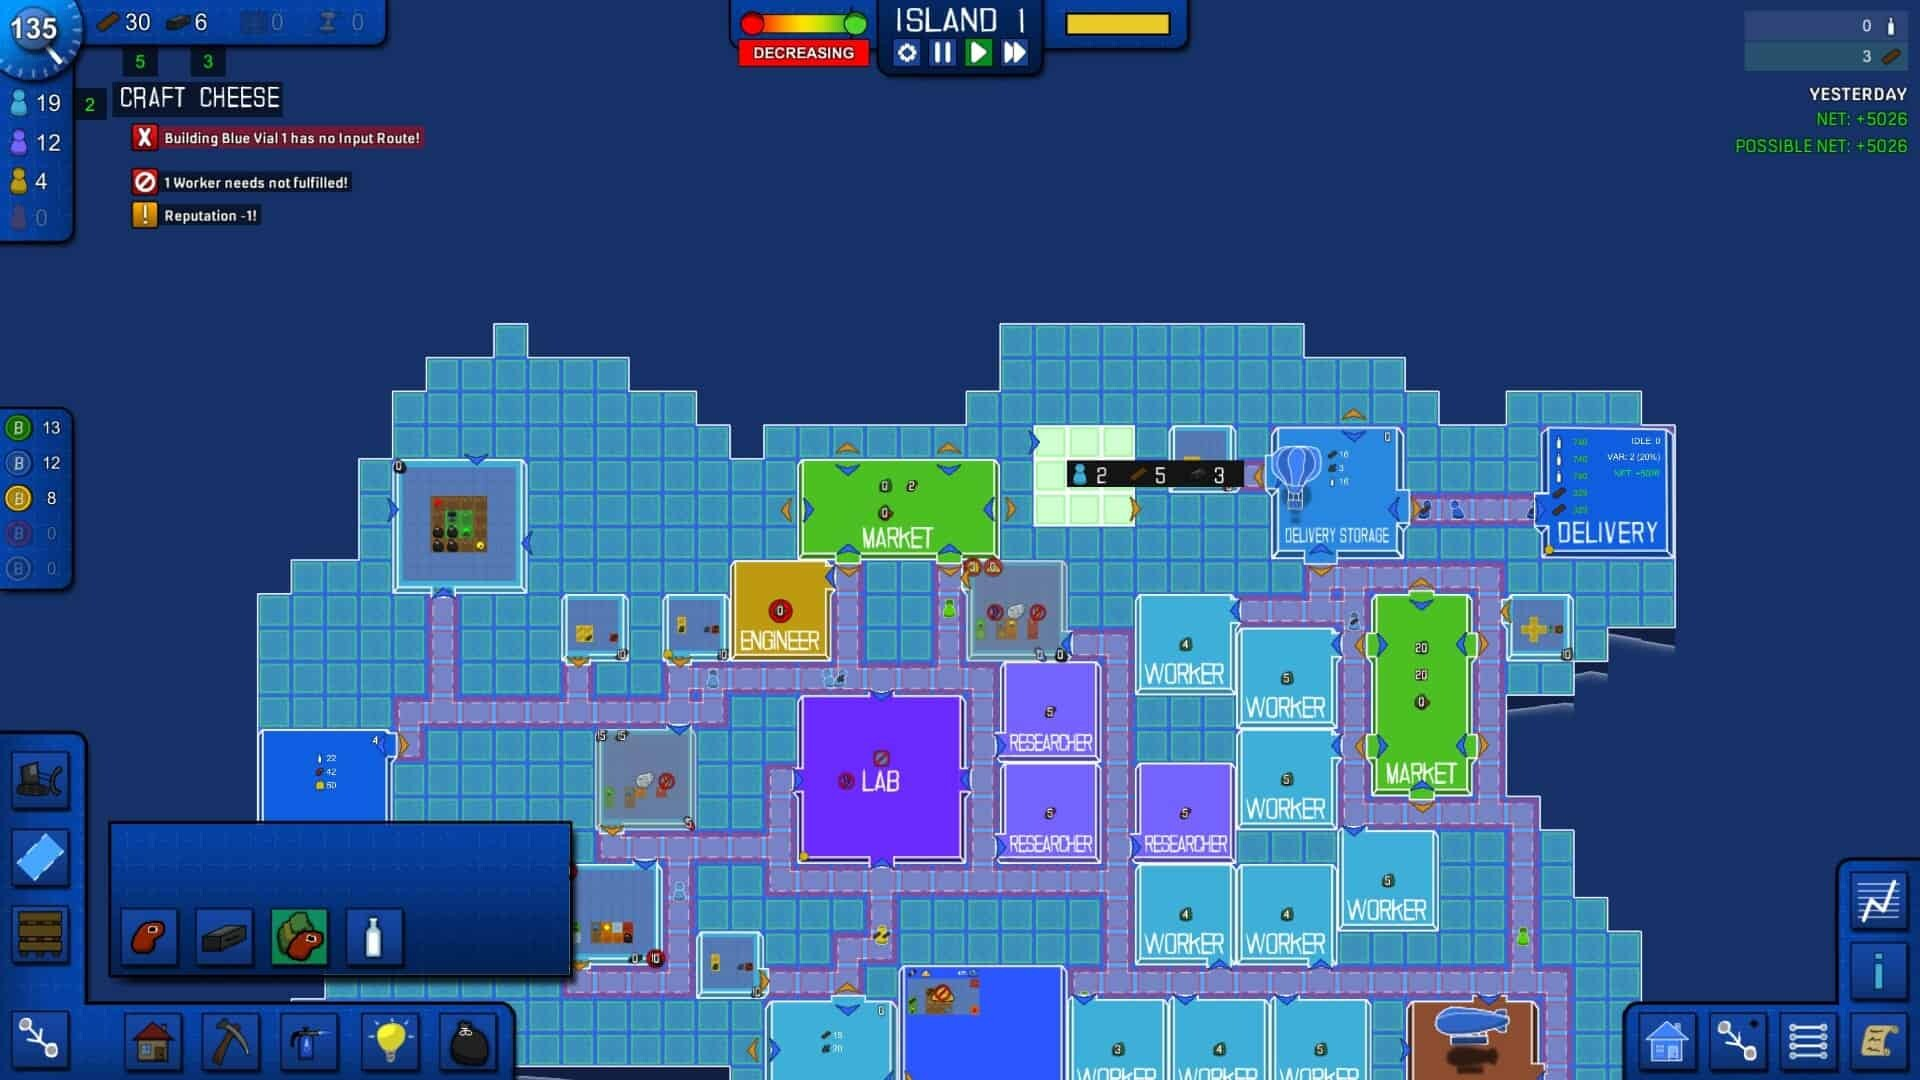 Blueprint Tycoon game screenshot, map close-up